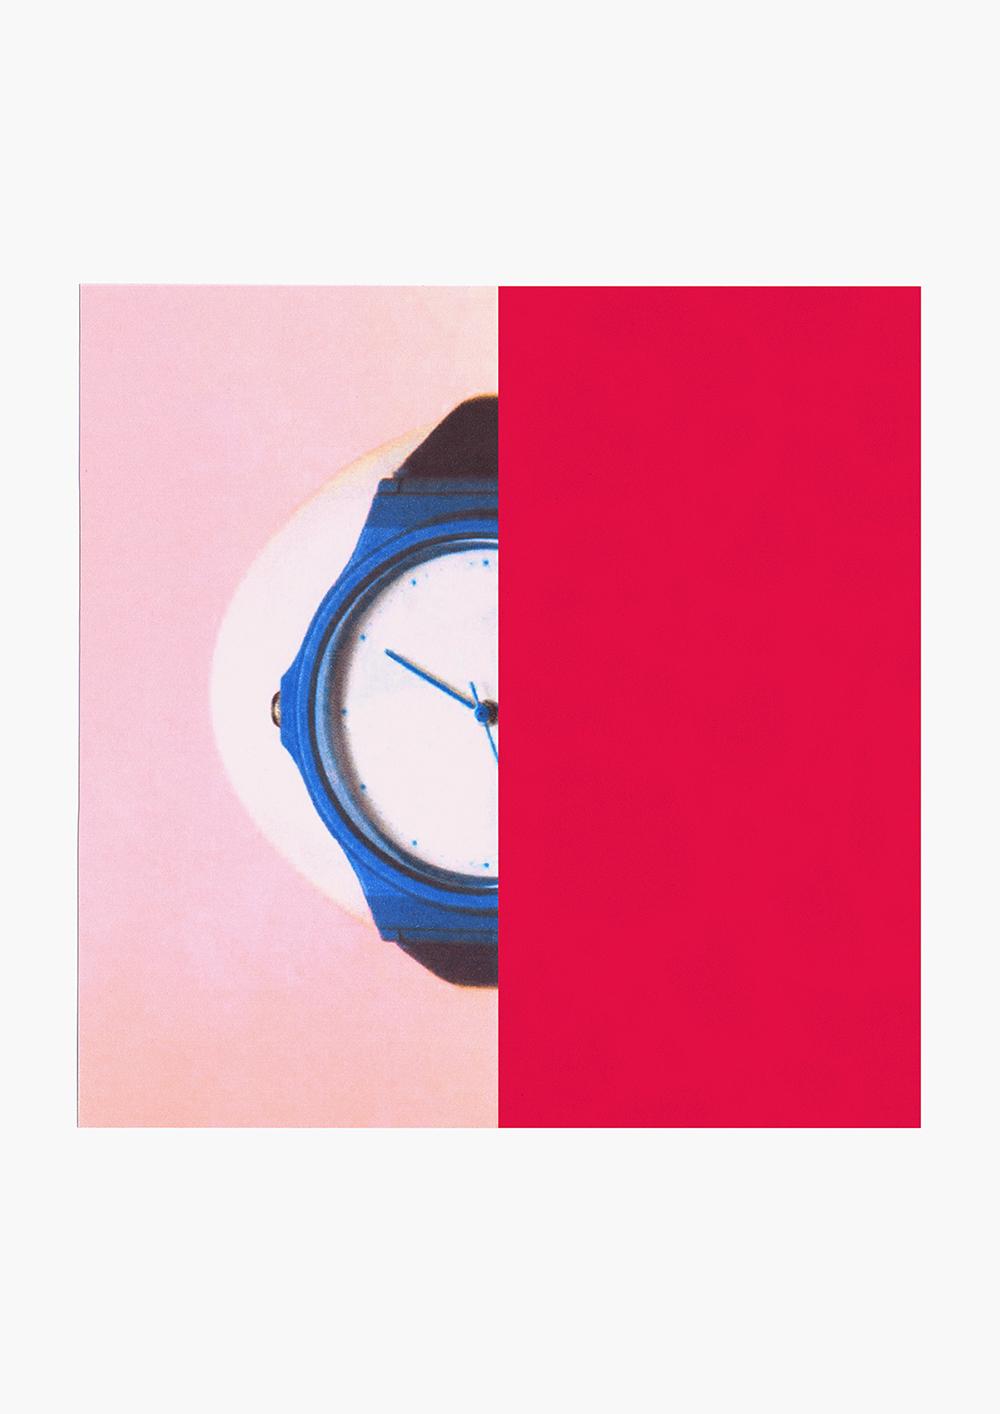 Pink & Red, 2015,Silk Screen